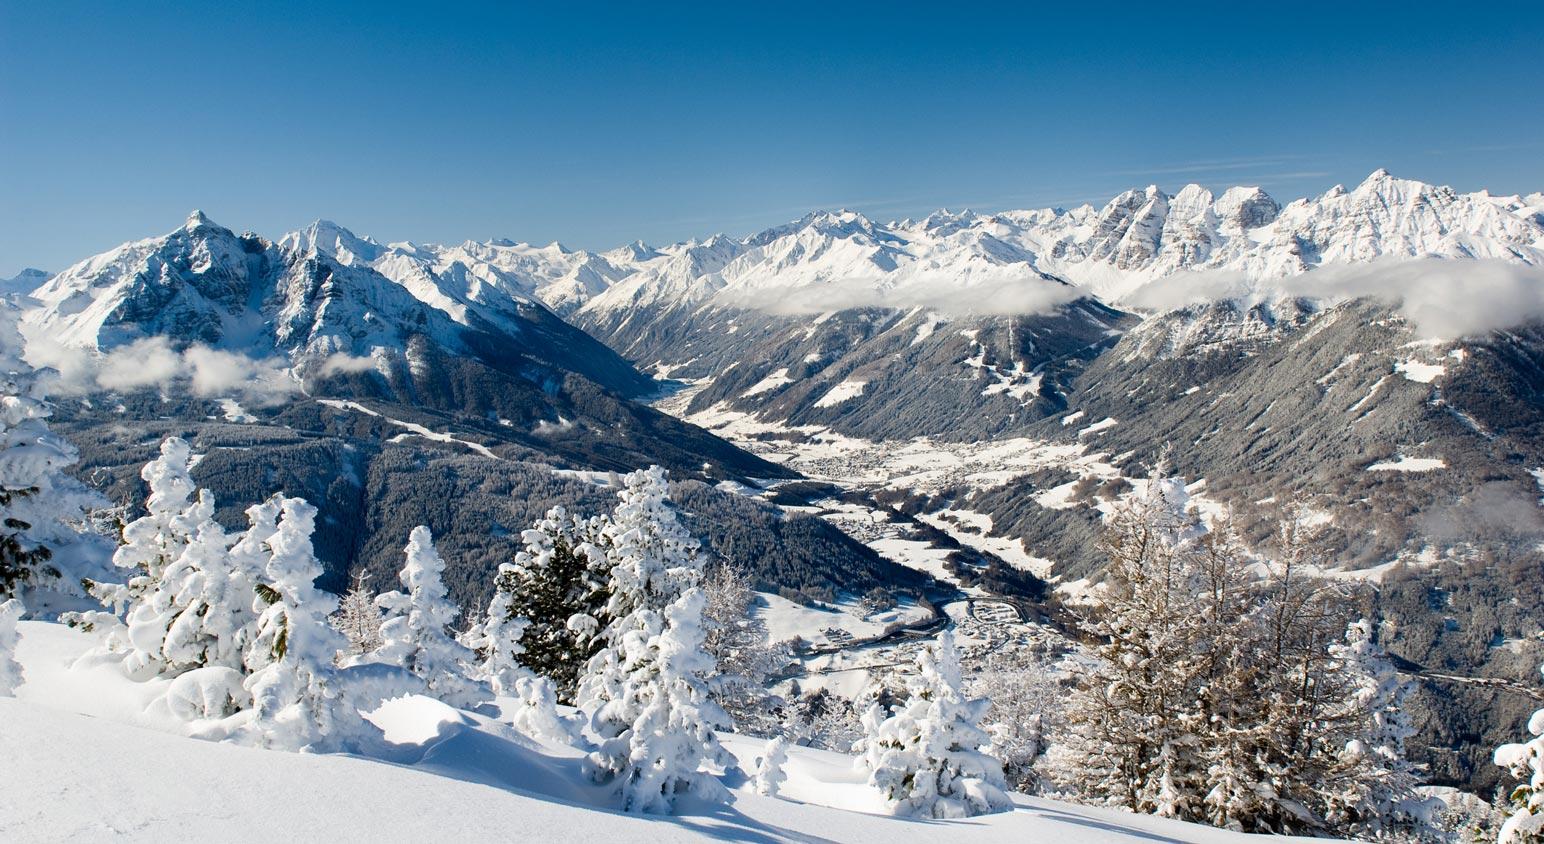 Stubai valley| Hotel Wiesenhof Mieders, Tyrol